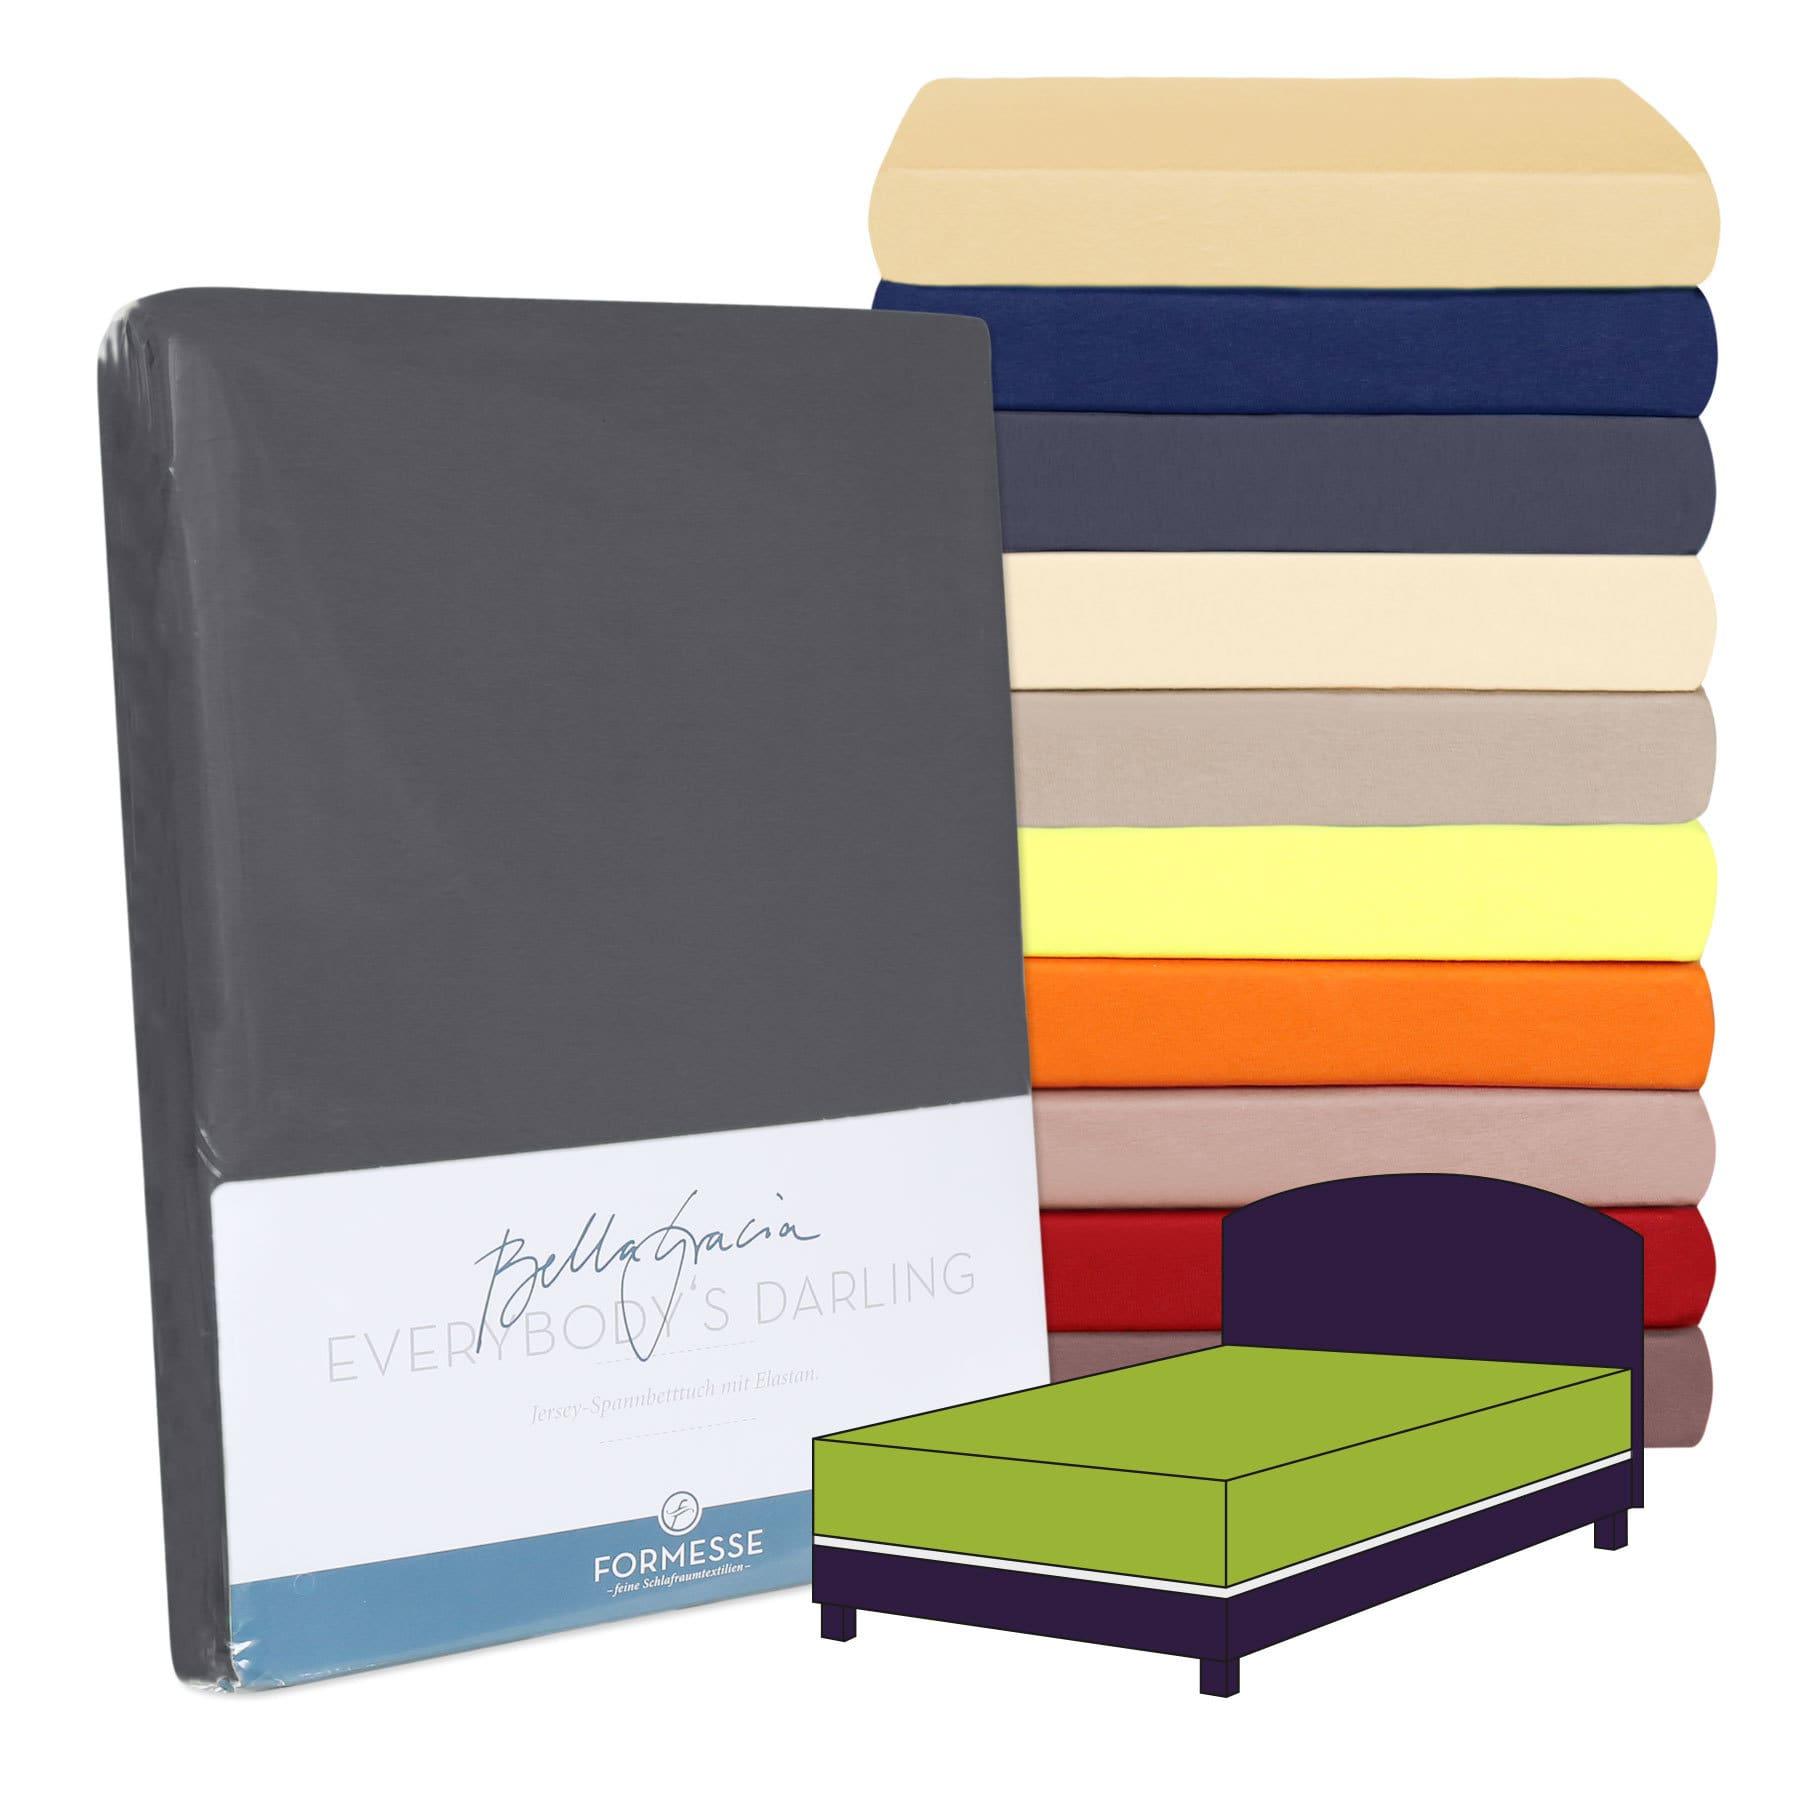 formesse boxspring spannbettlaken bella gracia alto g nstig online kaufen bei bettwaren shop. Black Bedroom Furniture Sets. Home Design Ideas